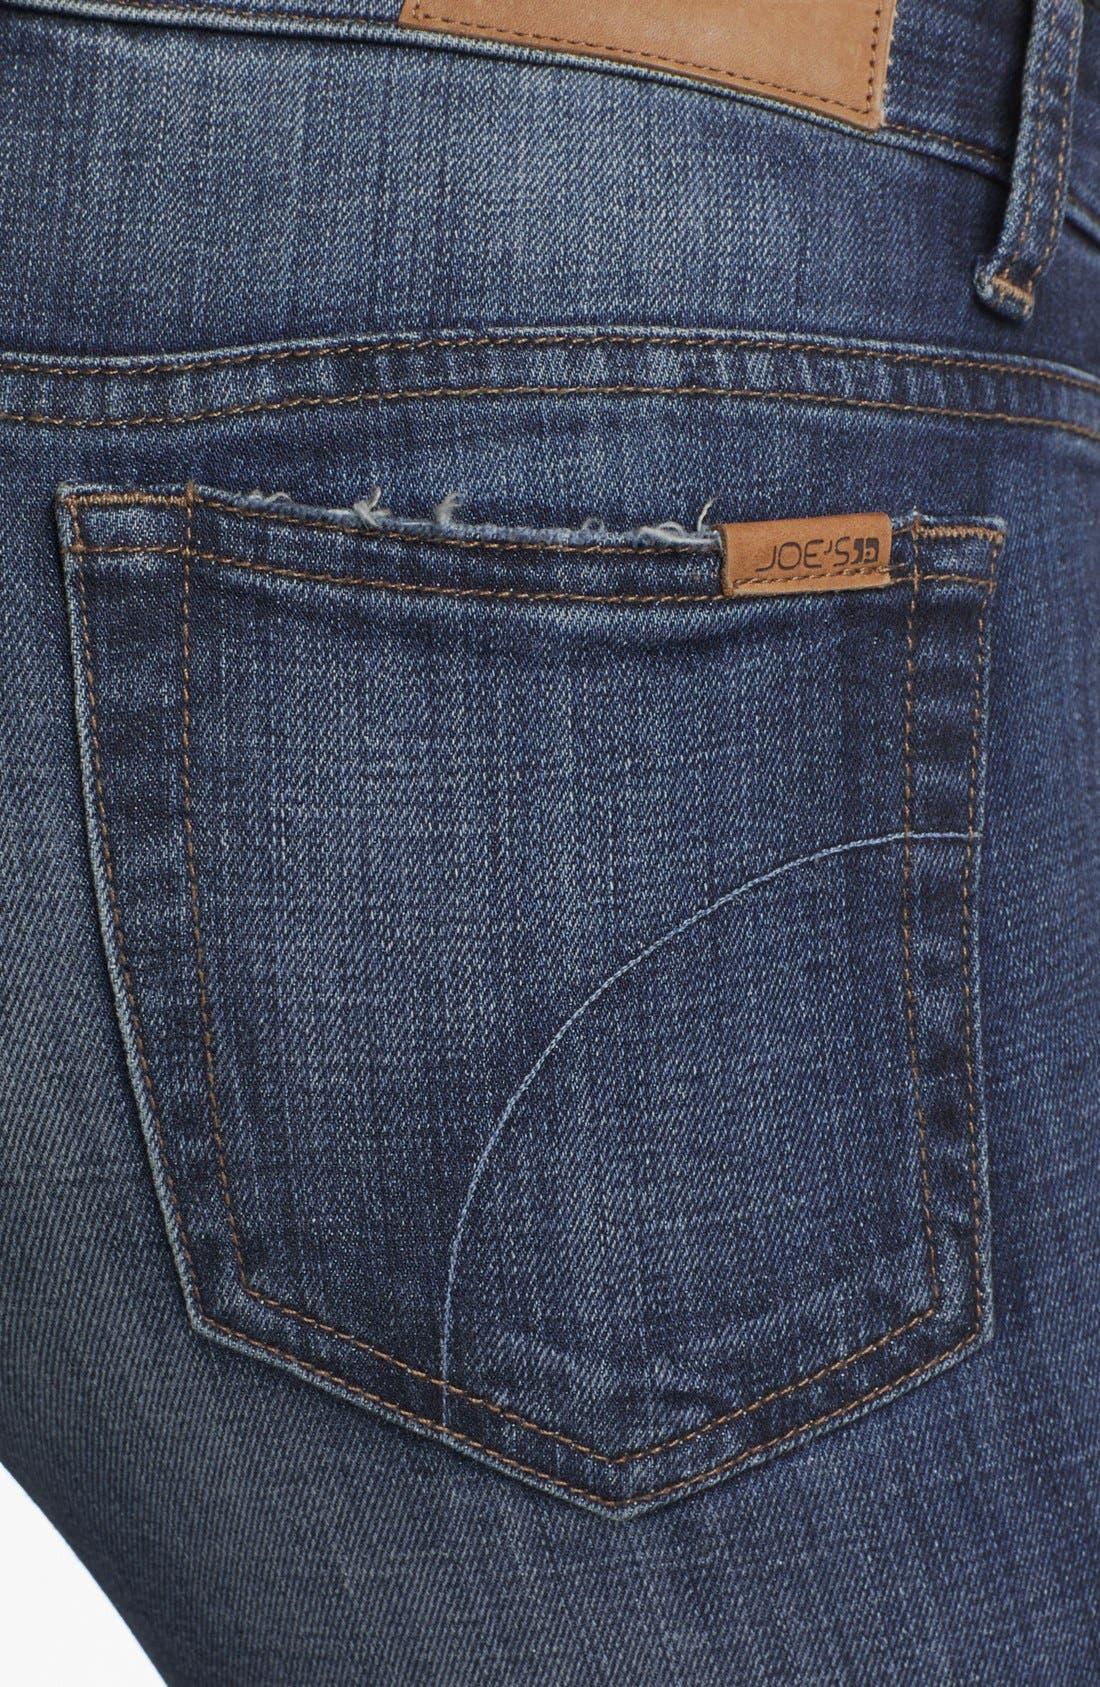 Straight Leg Ankle Jeans,                             Alternate thumbnail 3, color,                             400